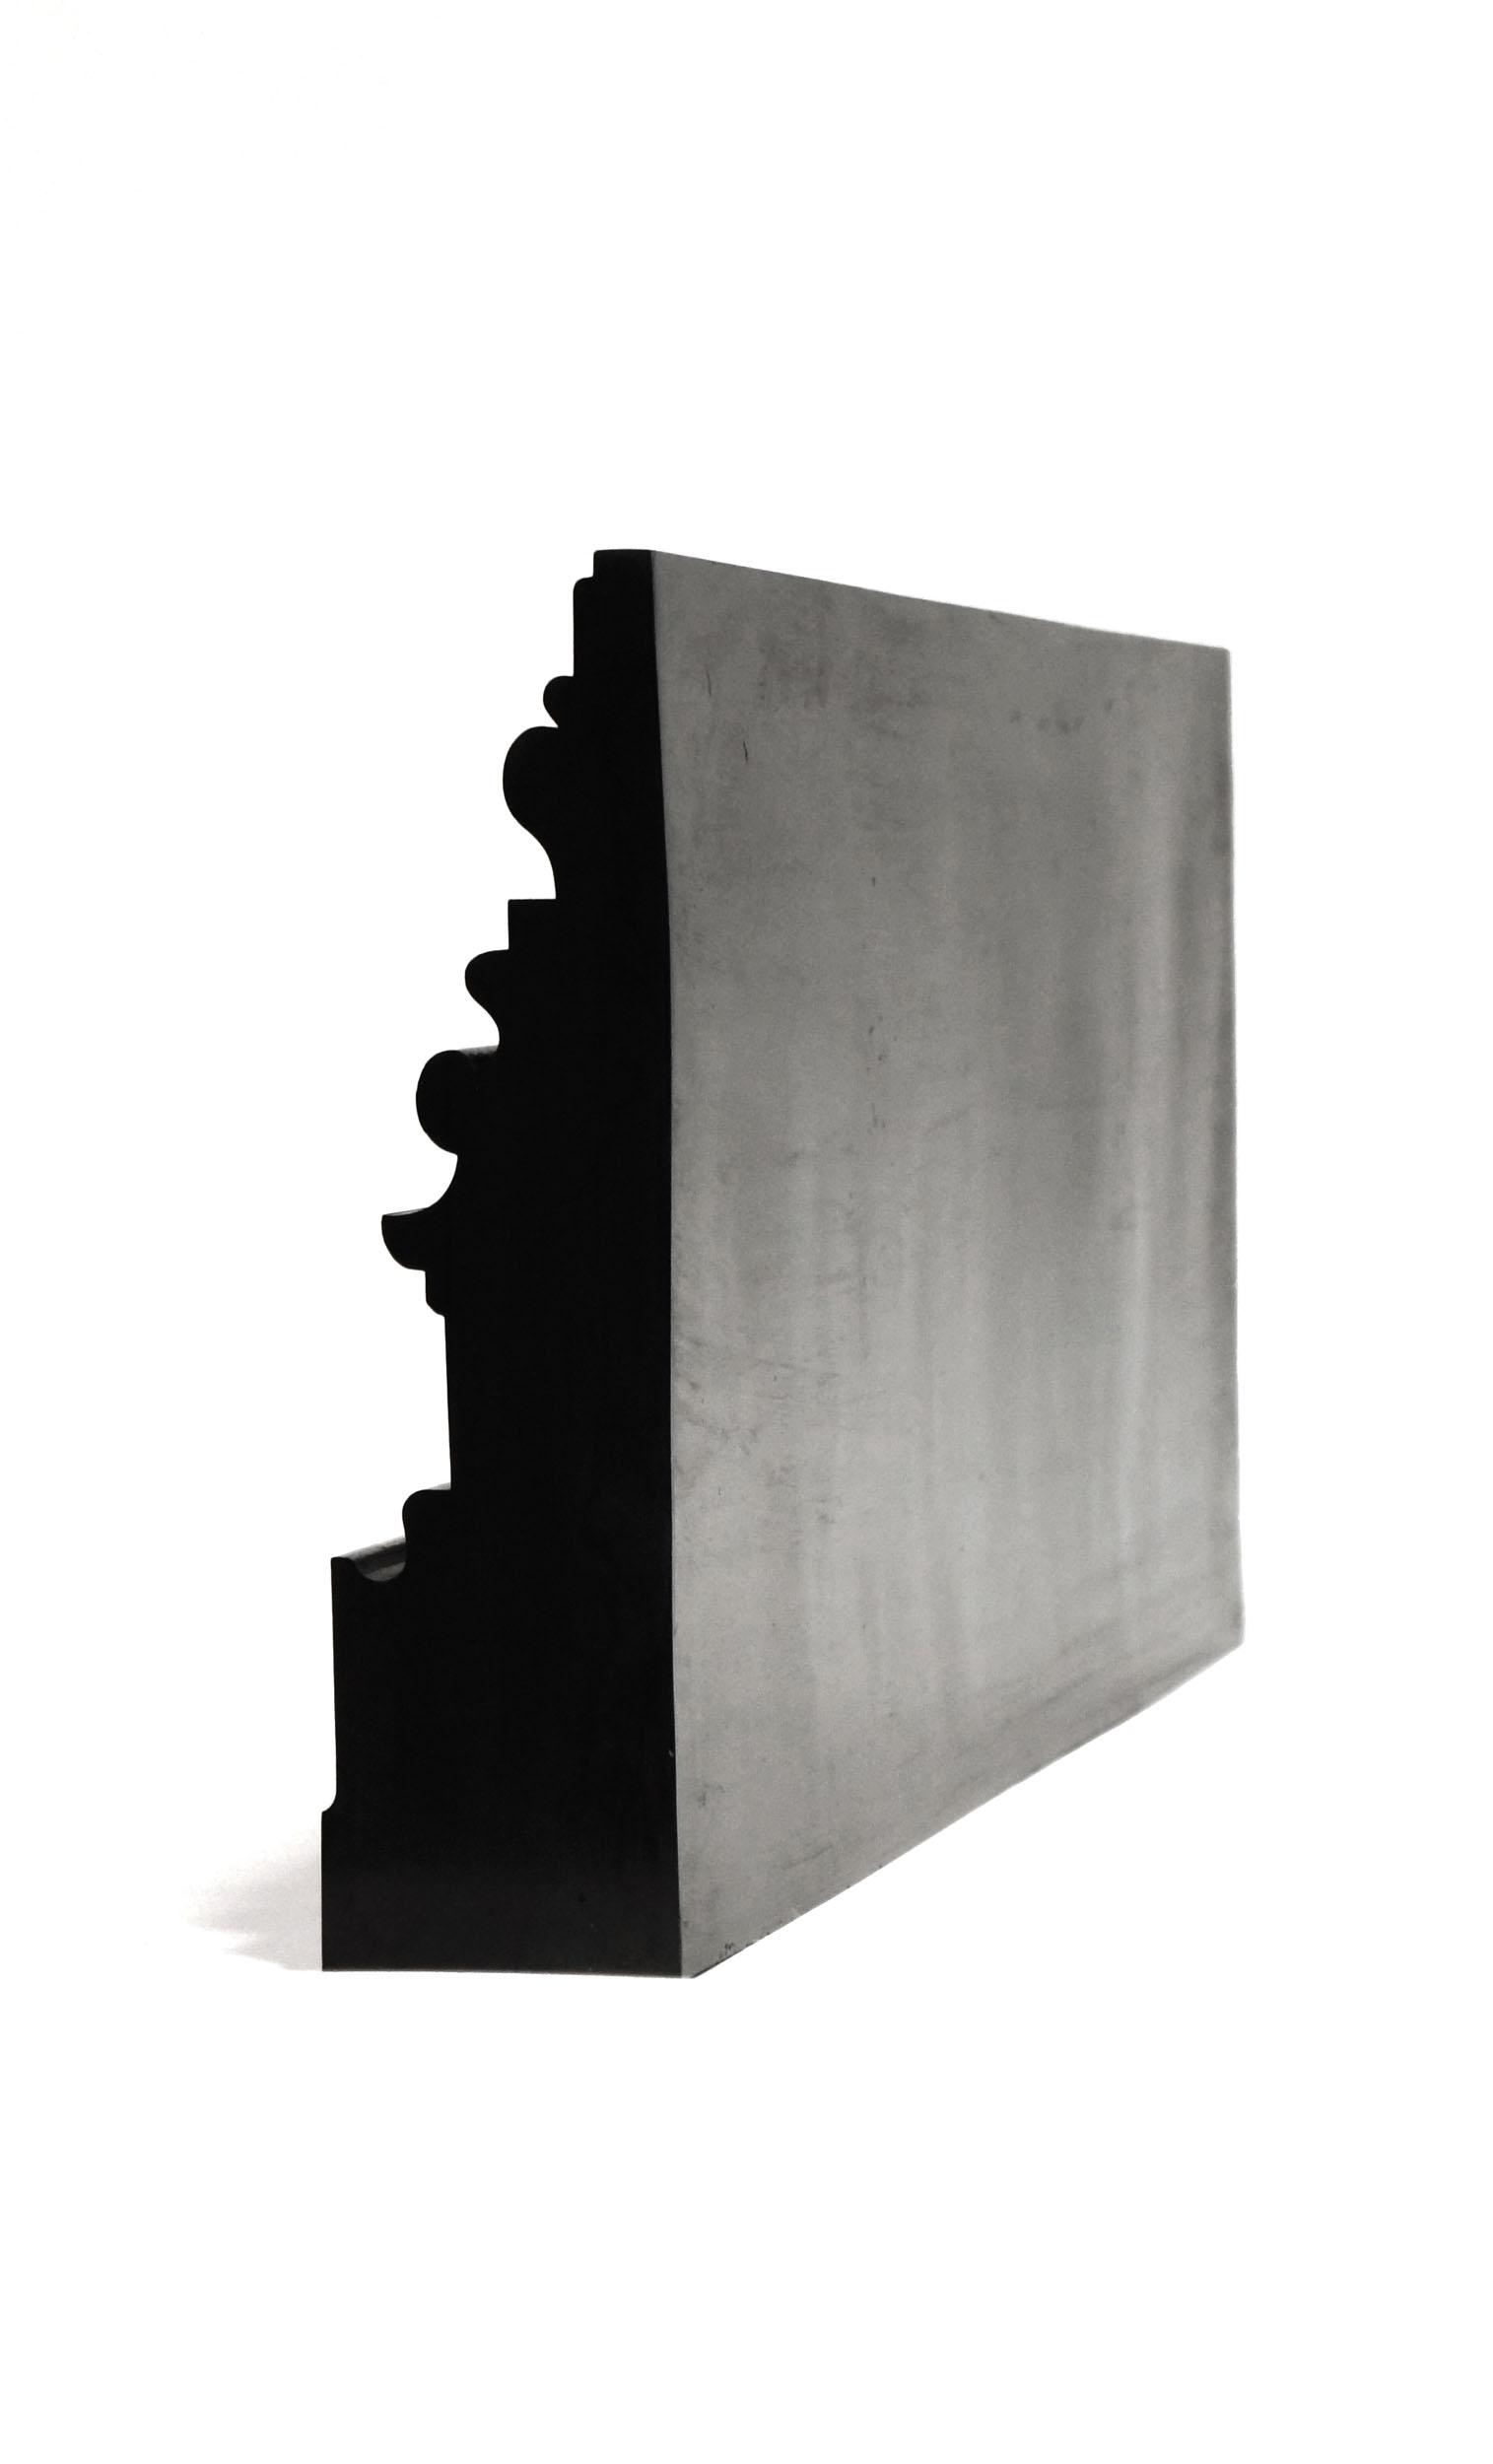 A black Bench Mould shelf on its back showing end profile